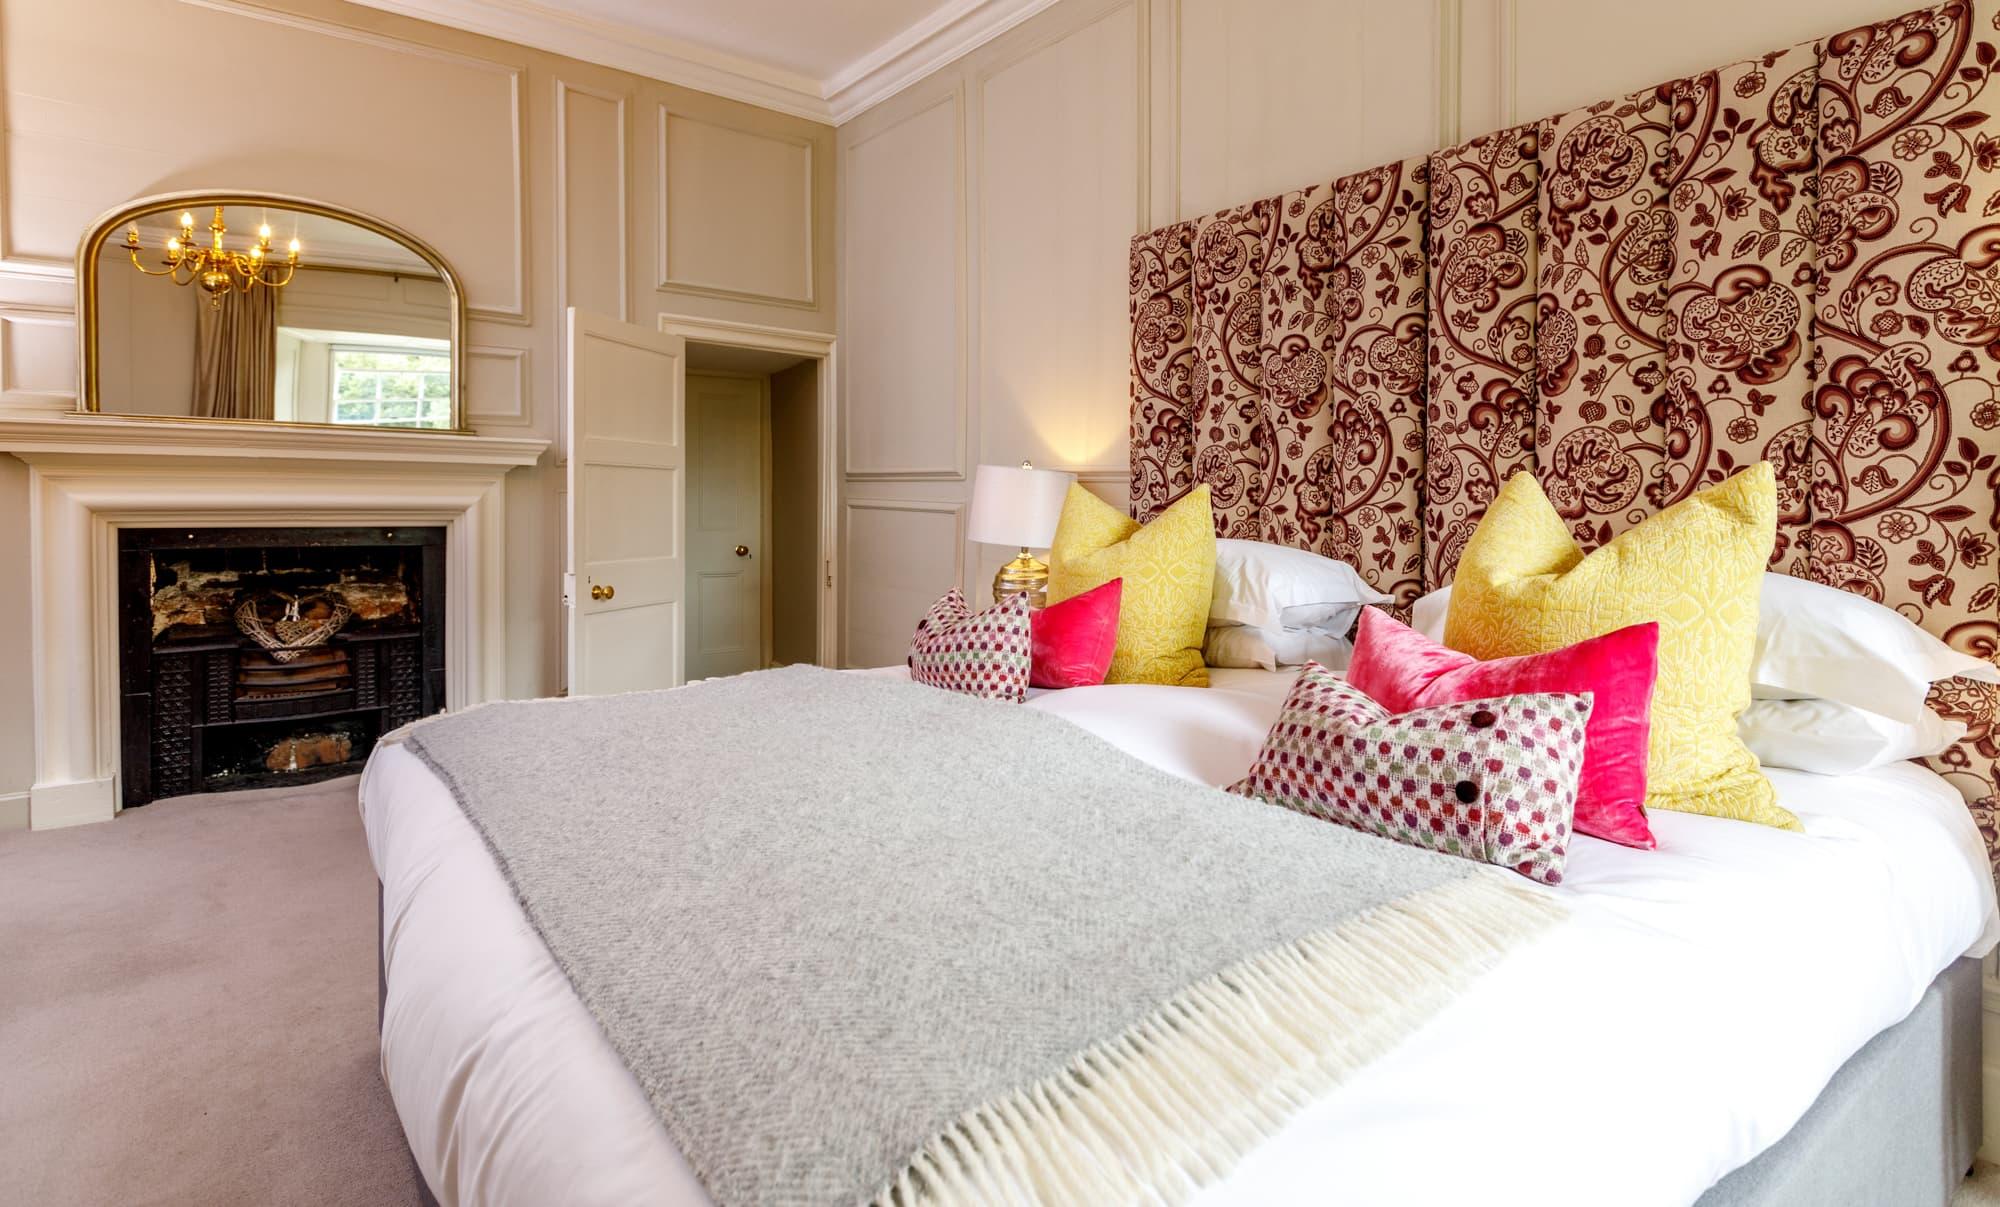 Daymer - bed and bathroom door-pichi